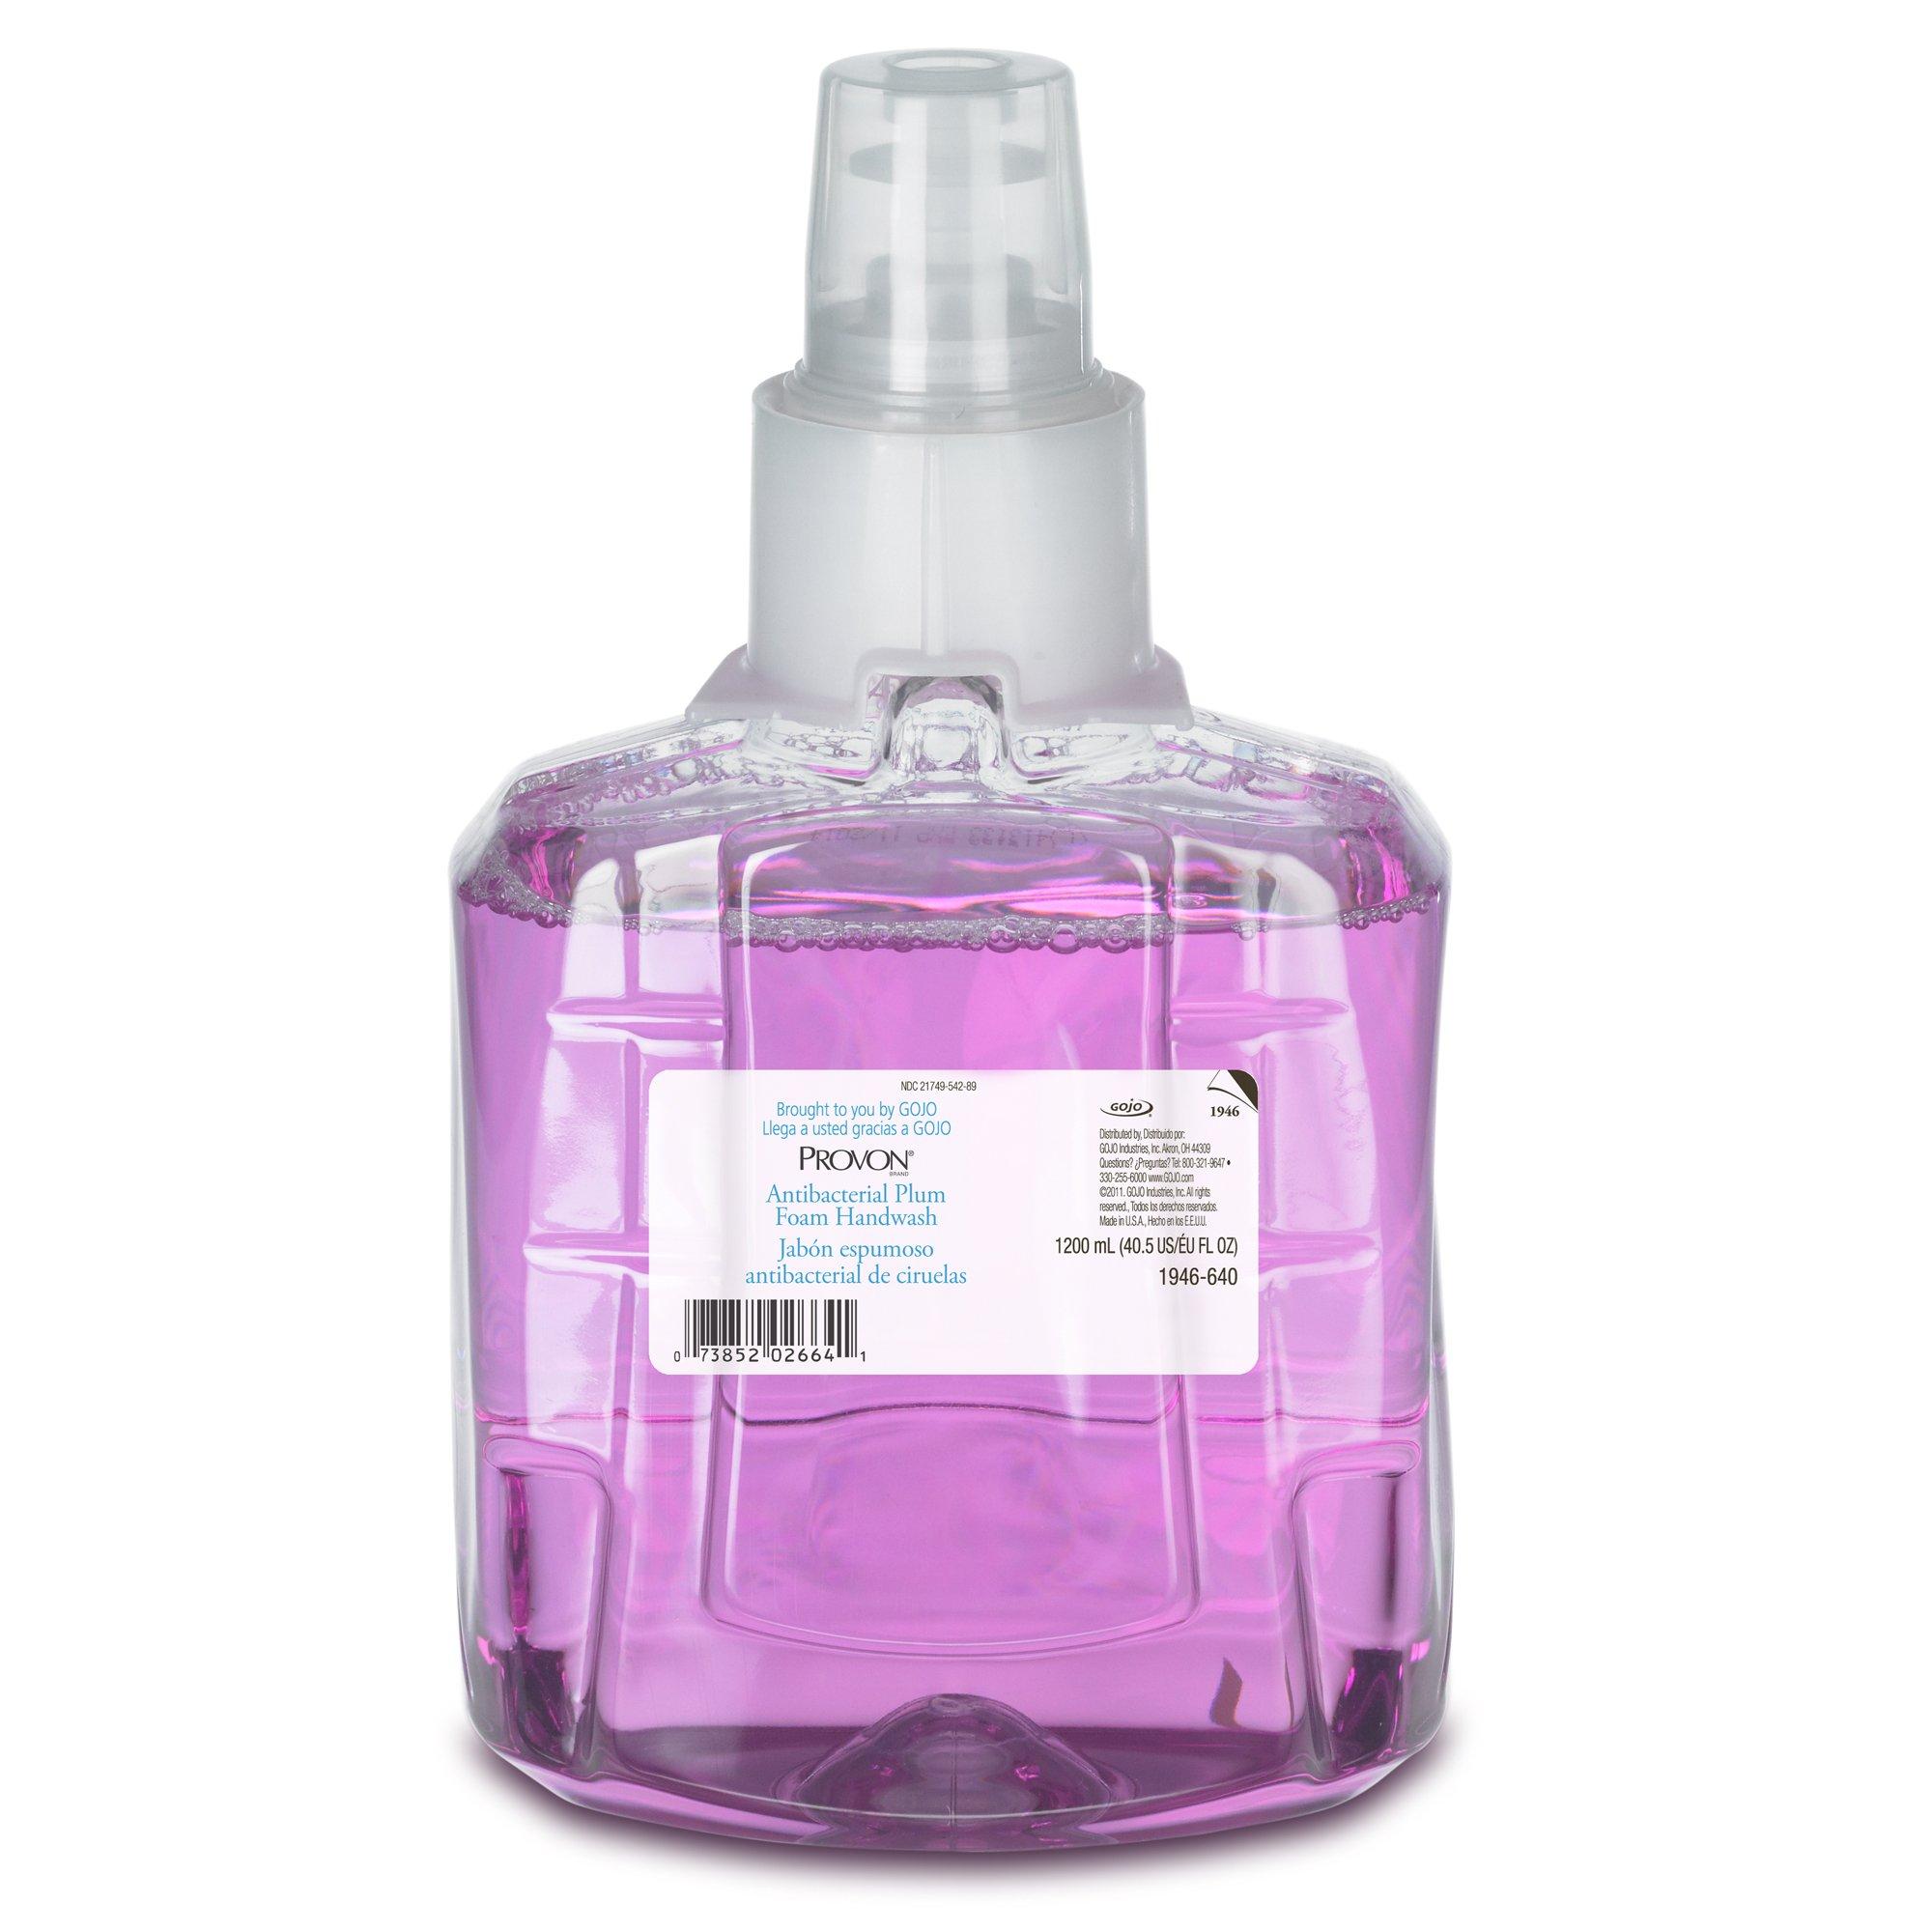 Provon 1946-02 Antibacterial Plum Foam Handwash, 1200 mL LTX-12 Refill (Pack of 2)